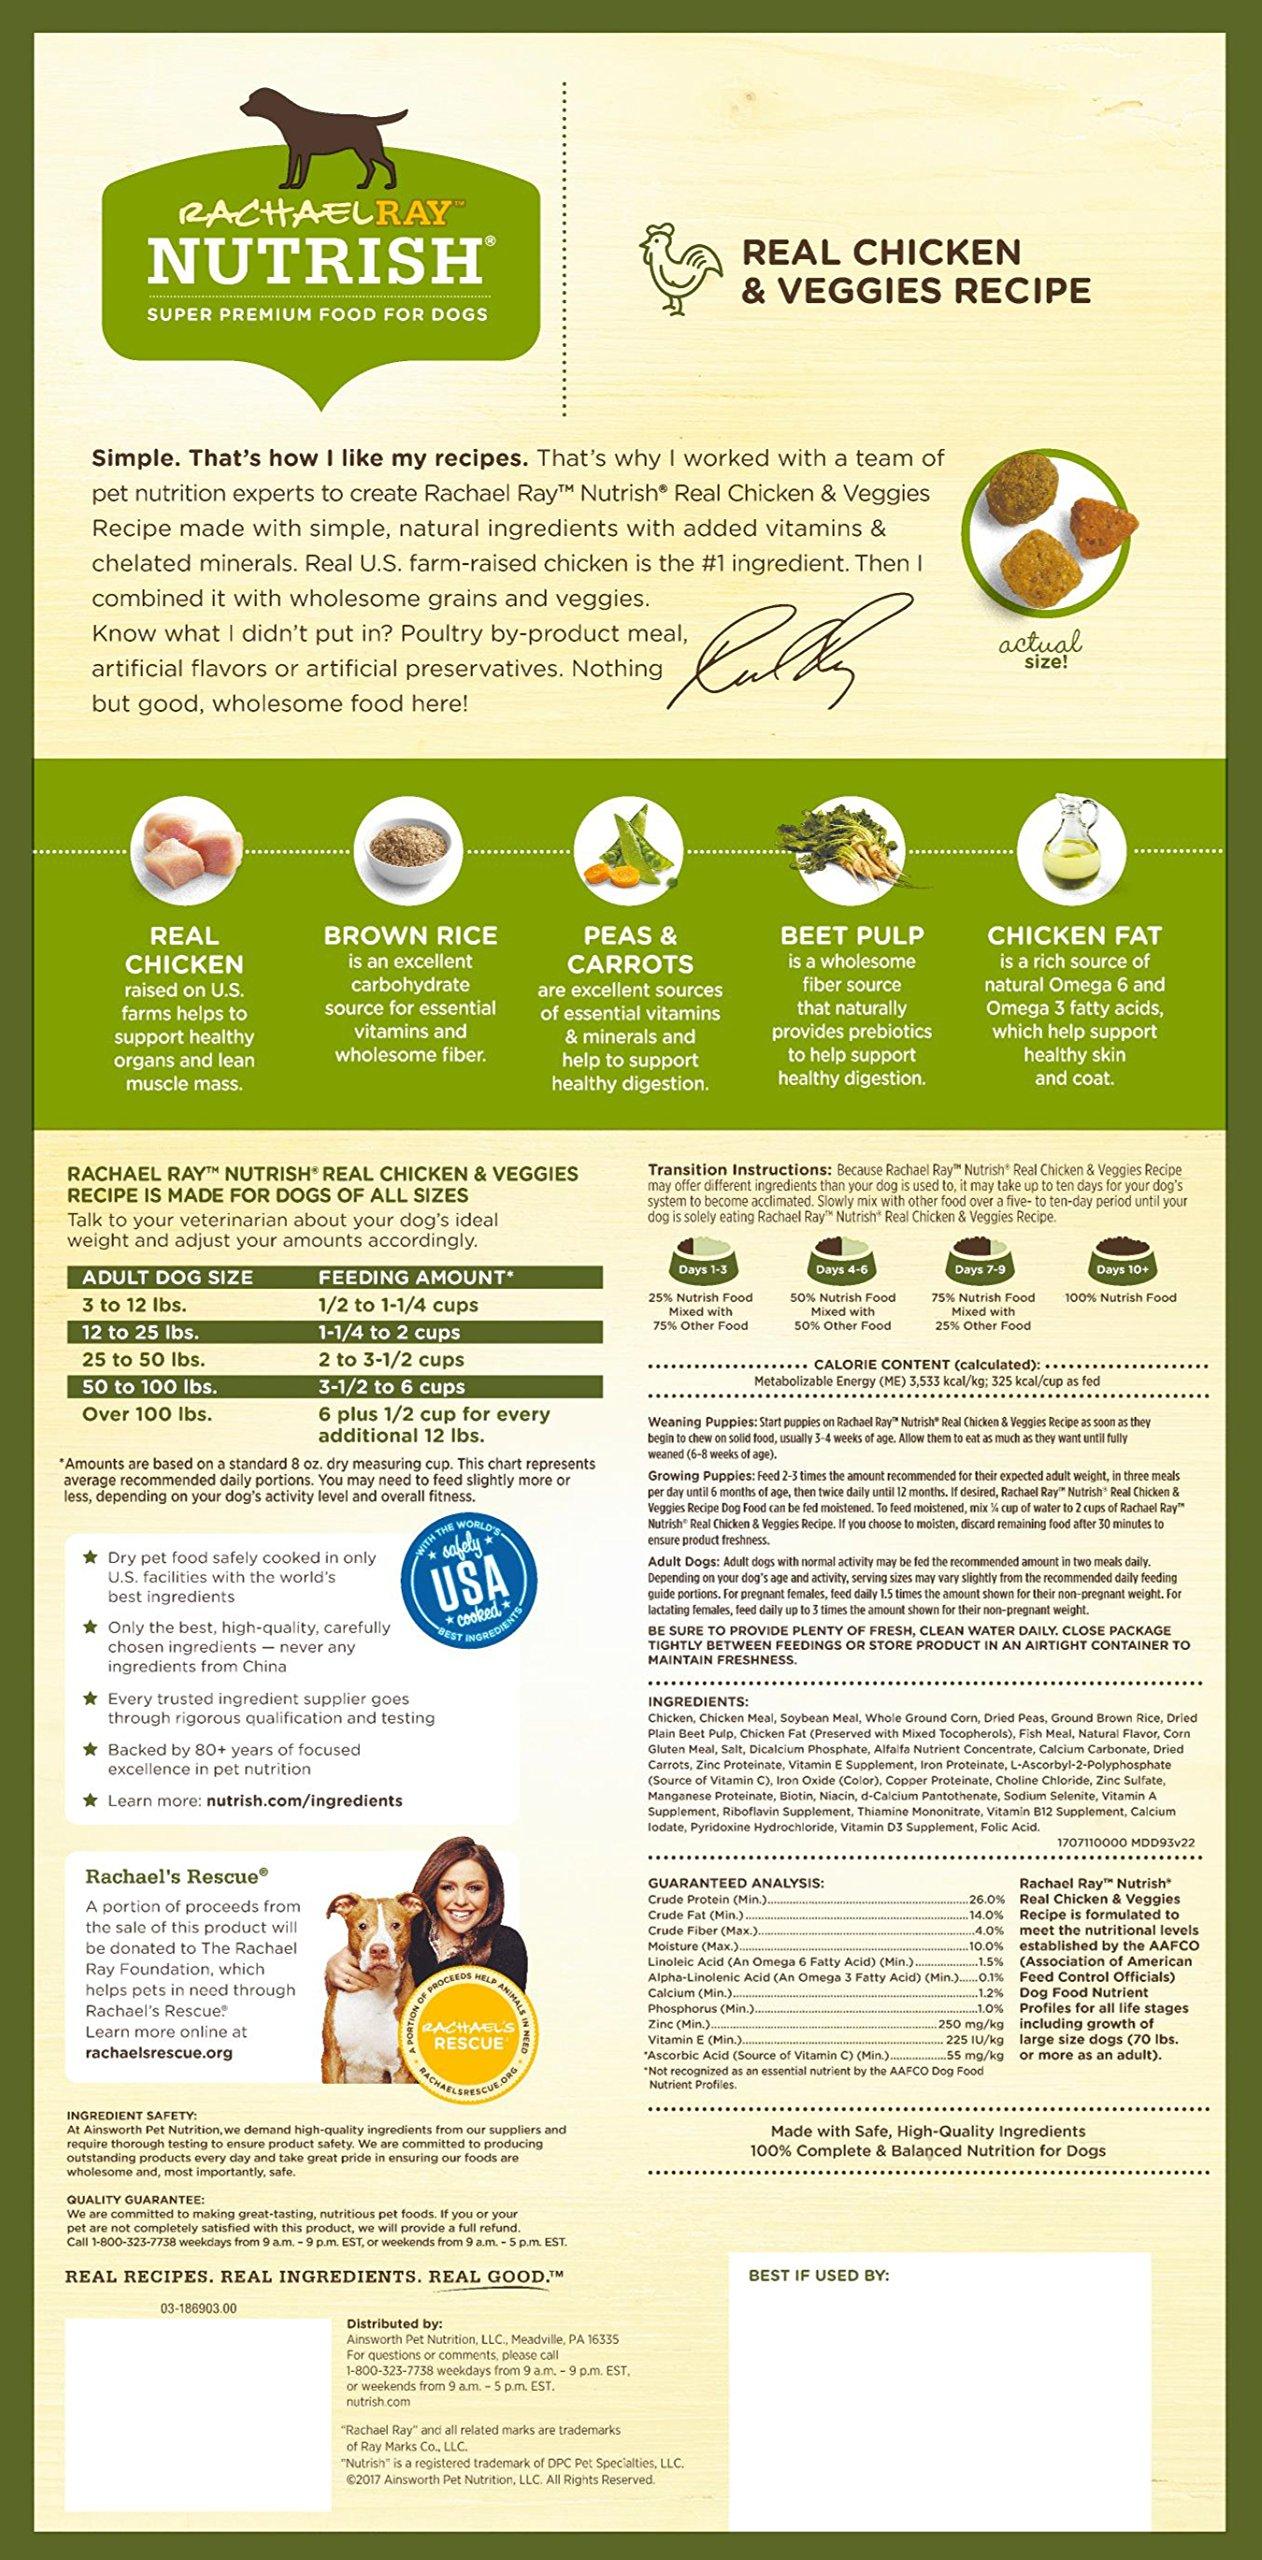 Rachael Ray Nutrish Natural Dry Dog Food, Real Chicken & Veggies Recipe, 28 lbs by Rachael Ray Nutrish (Image #2)